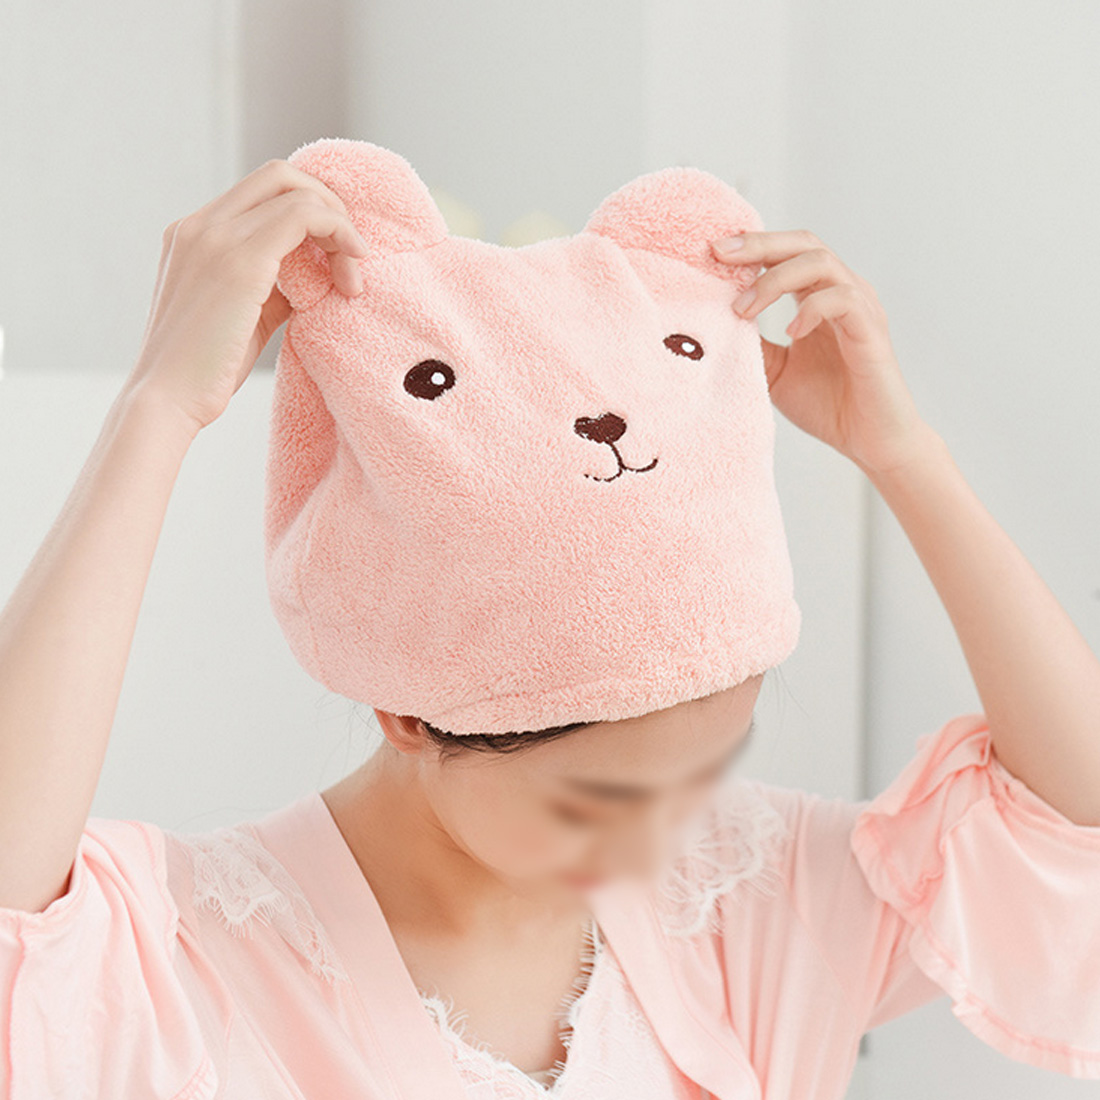 Cute Bear Shower Cap Women Bathroom Super Absorbent Quick-drying Bath Towel Hair Dry Cap Salon Towel Bathroom Products